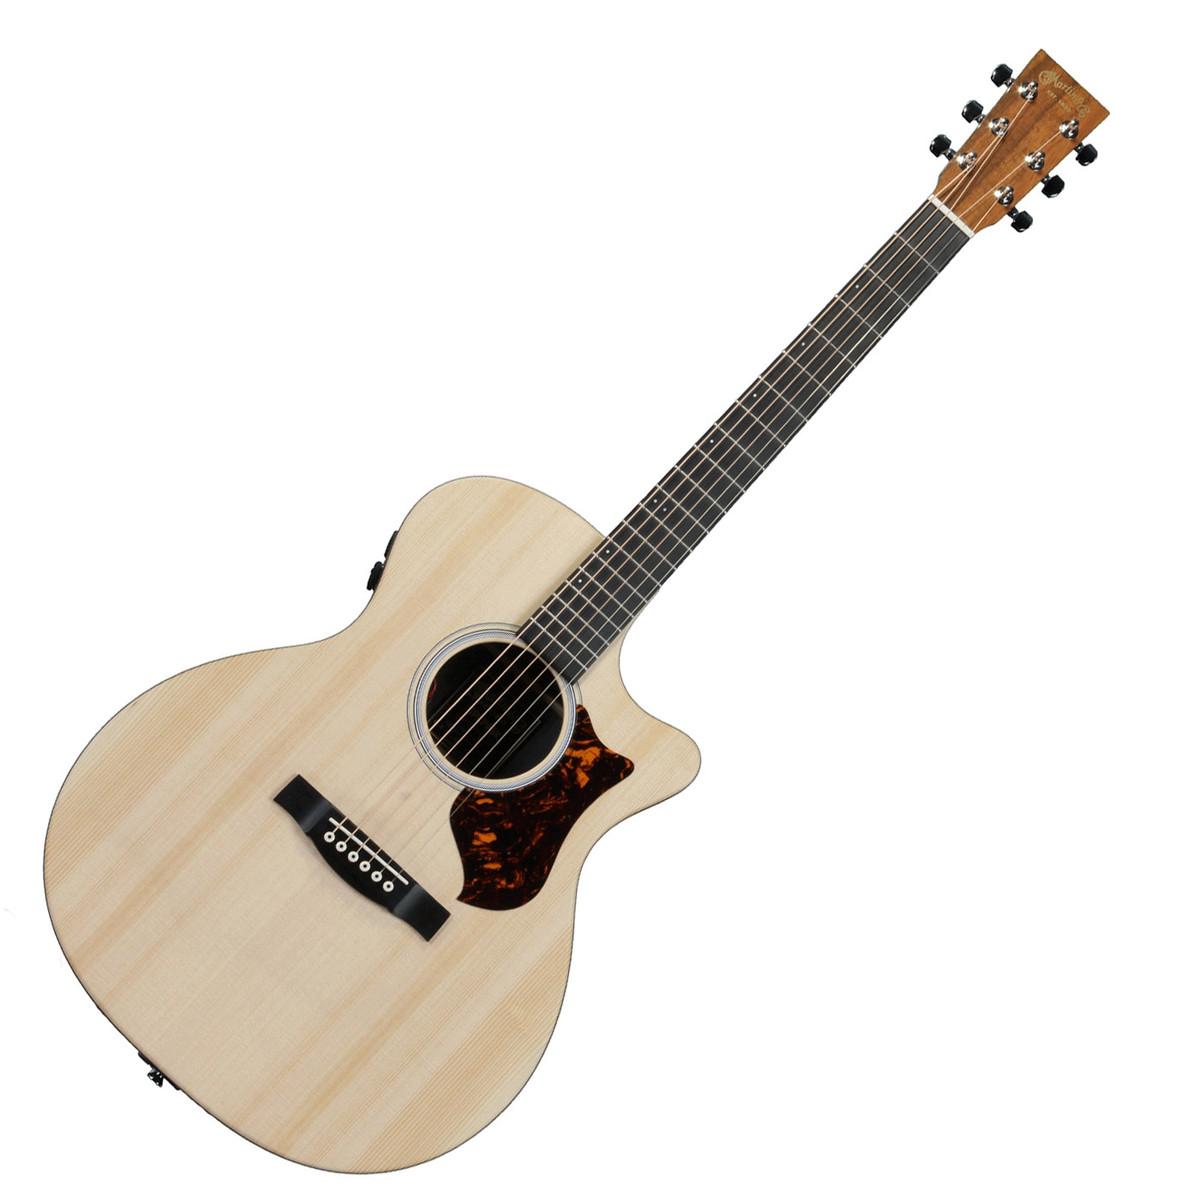 disc martin guitare electro acoustique gpcpa5k koa. Black Bedroom Furniture Sets. Home Design Ideas